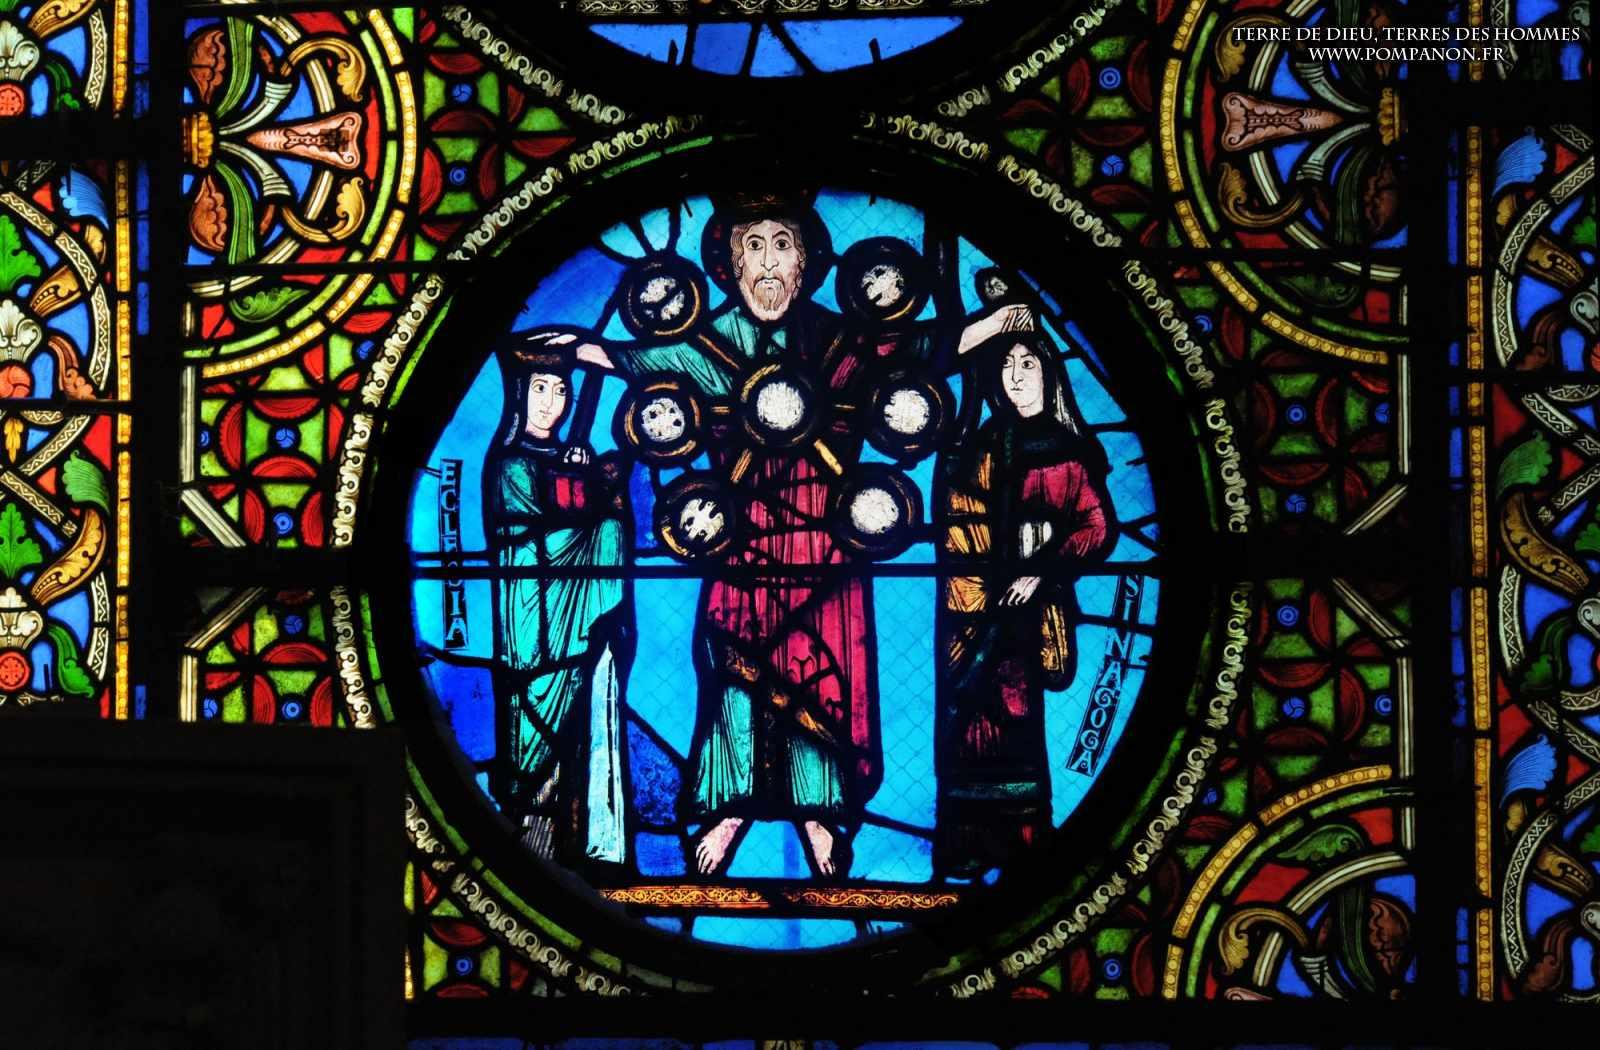 Les vitraux  du XIIIéme siècle . 5043eefcc2a4b